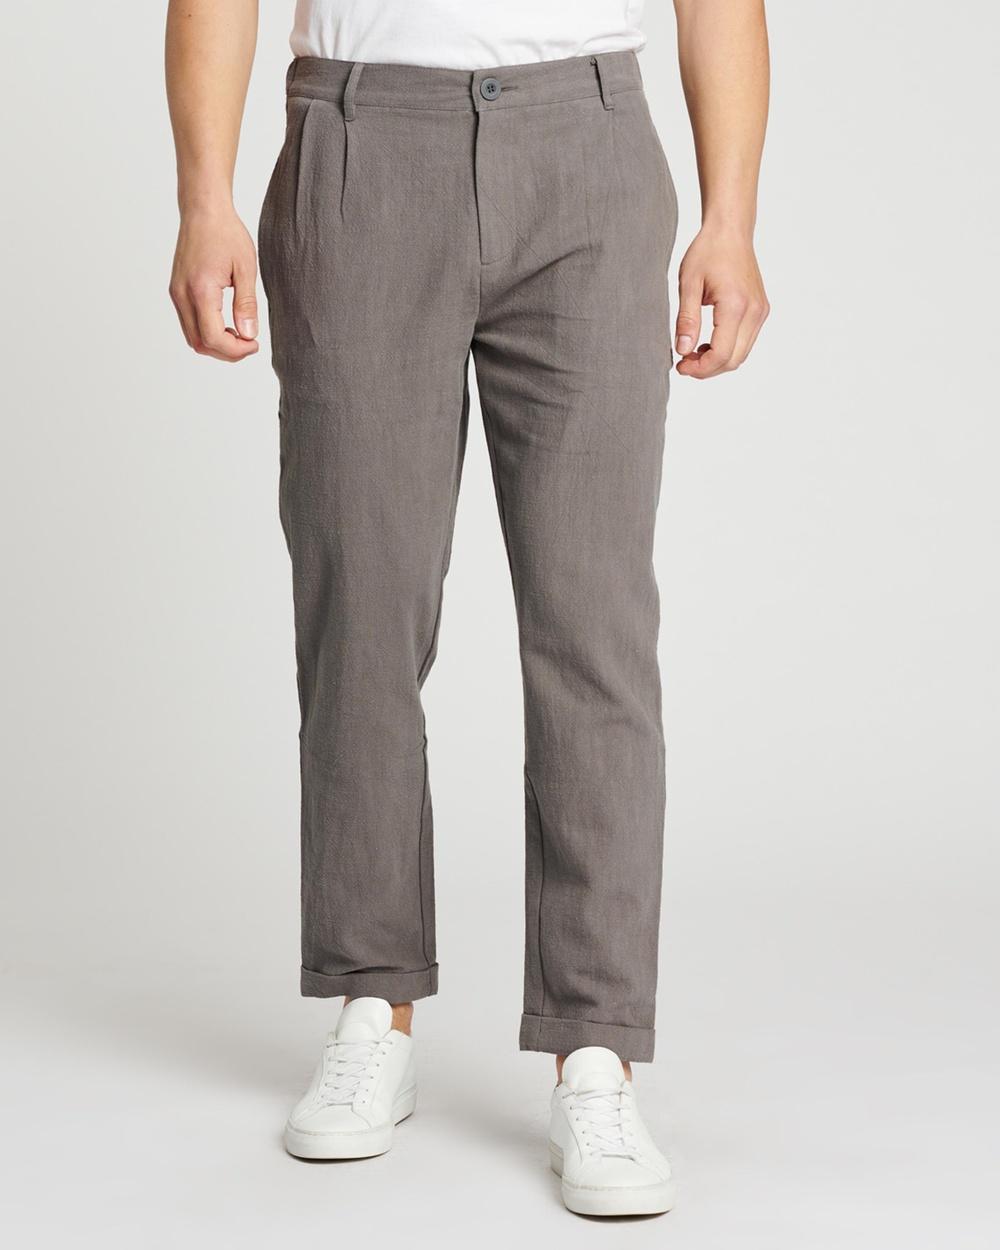 AERE Ramie Pleated Pants Charcoal